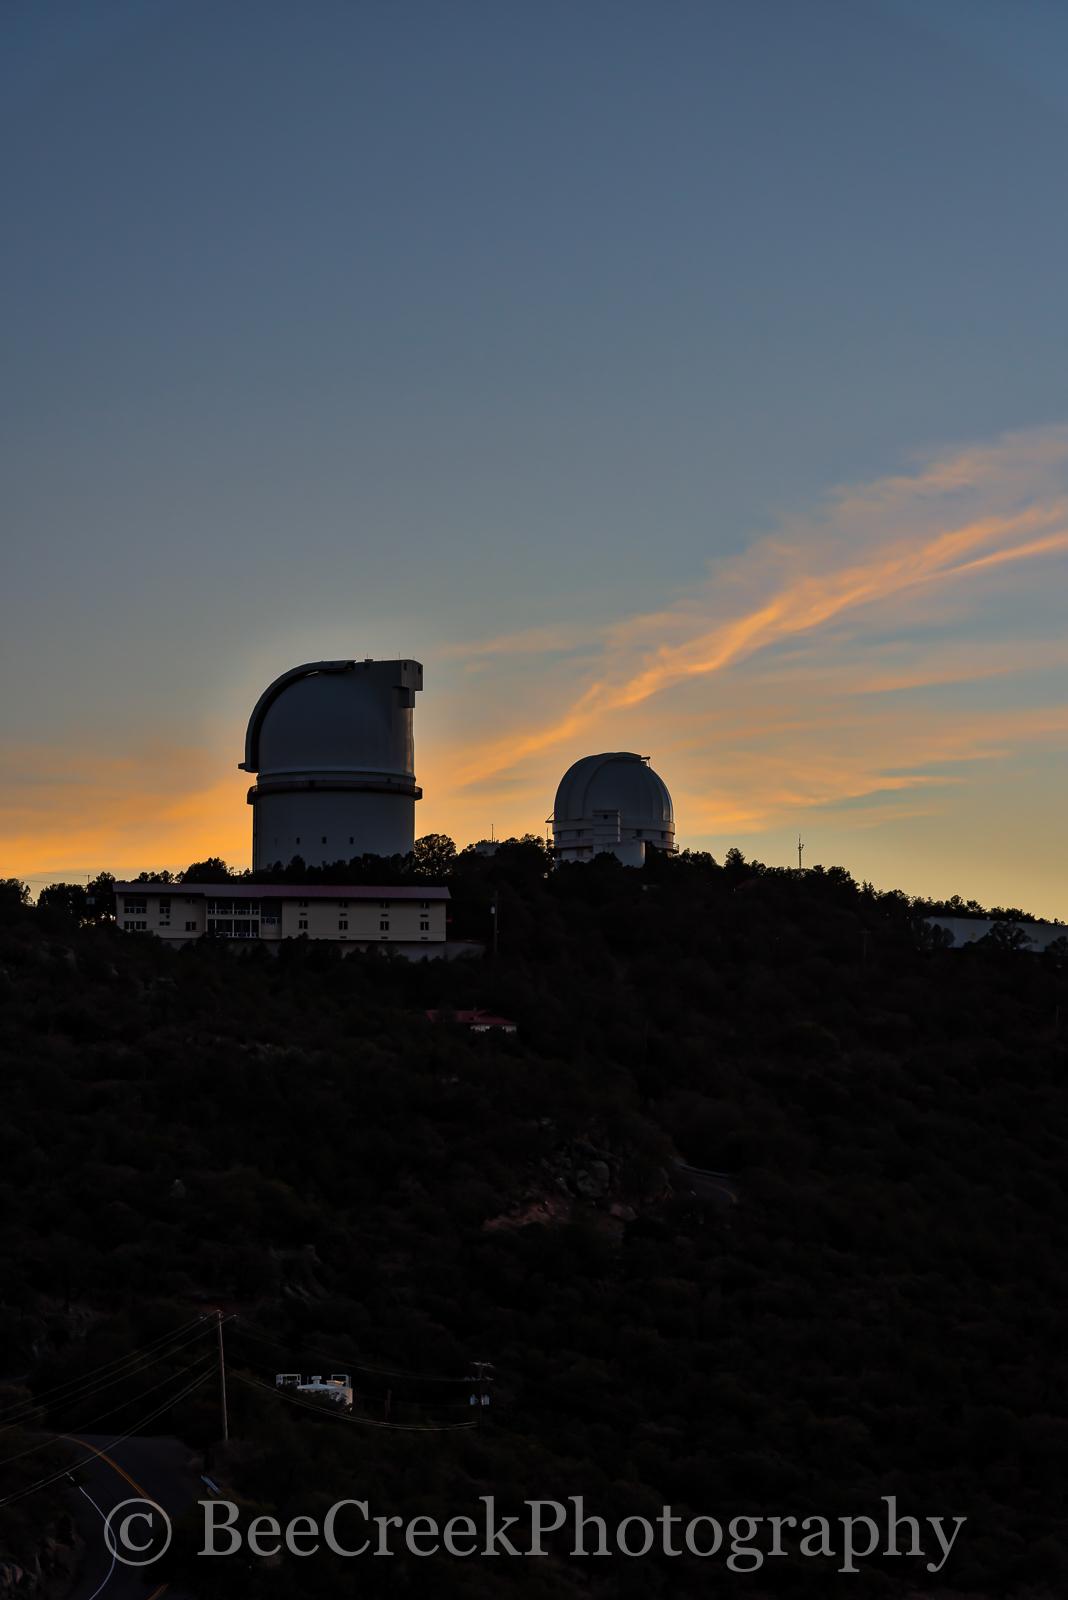 Davis mountains, Fort Davis, McDonald Observatory, colorful, glow, silouette., sunset, west texas, photo